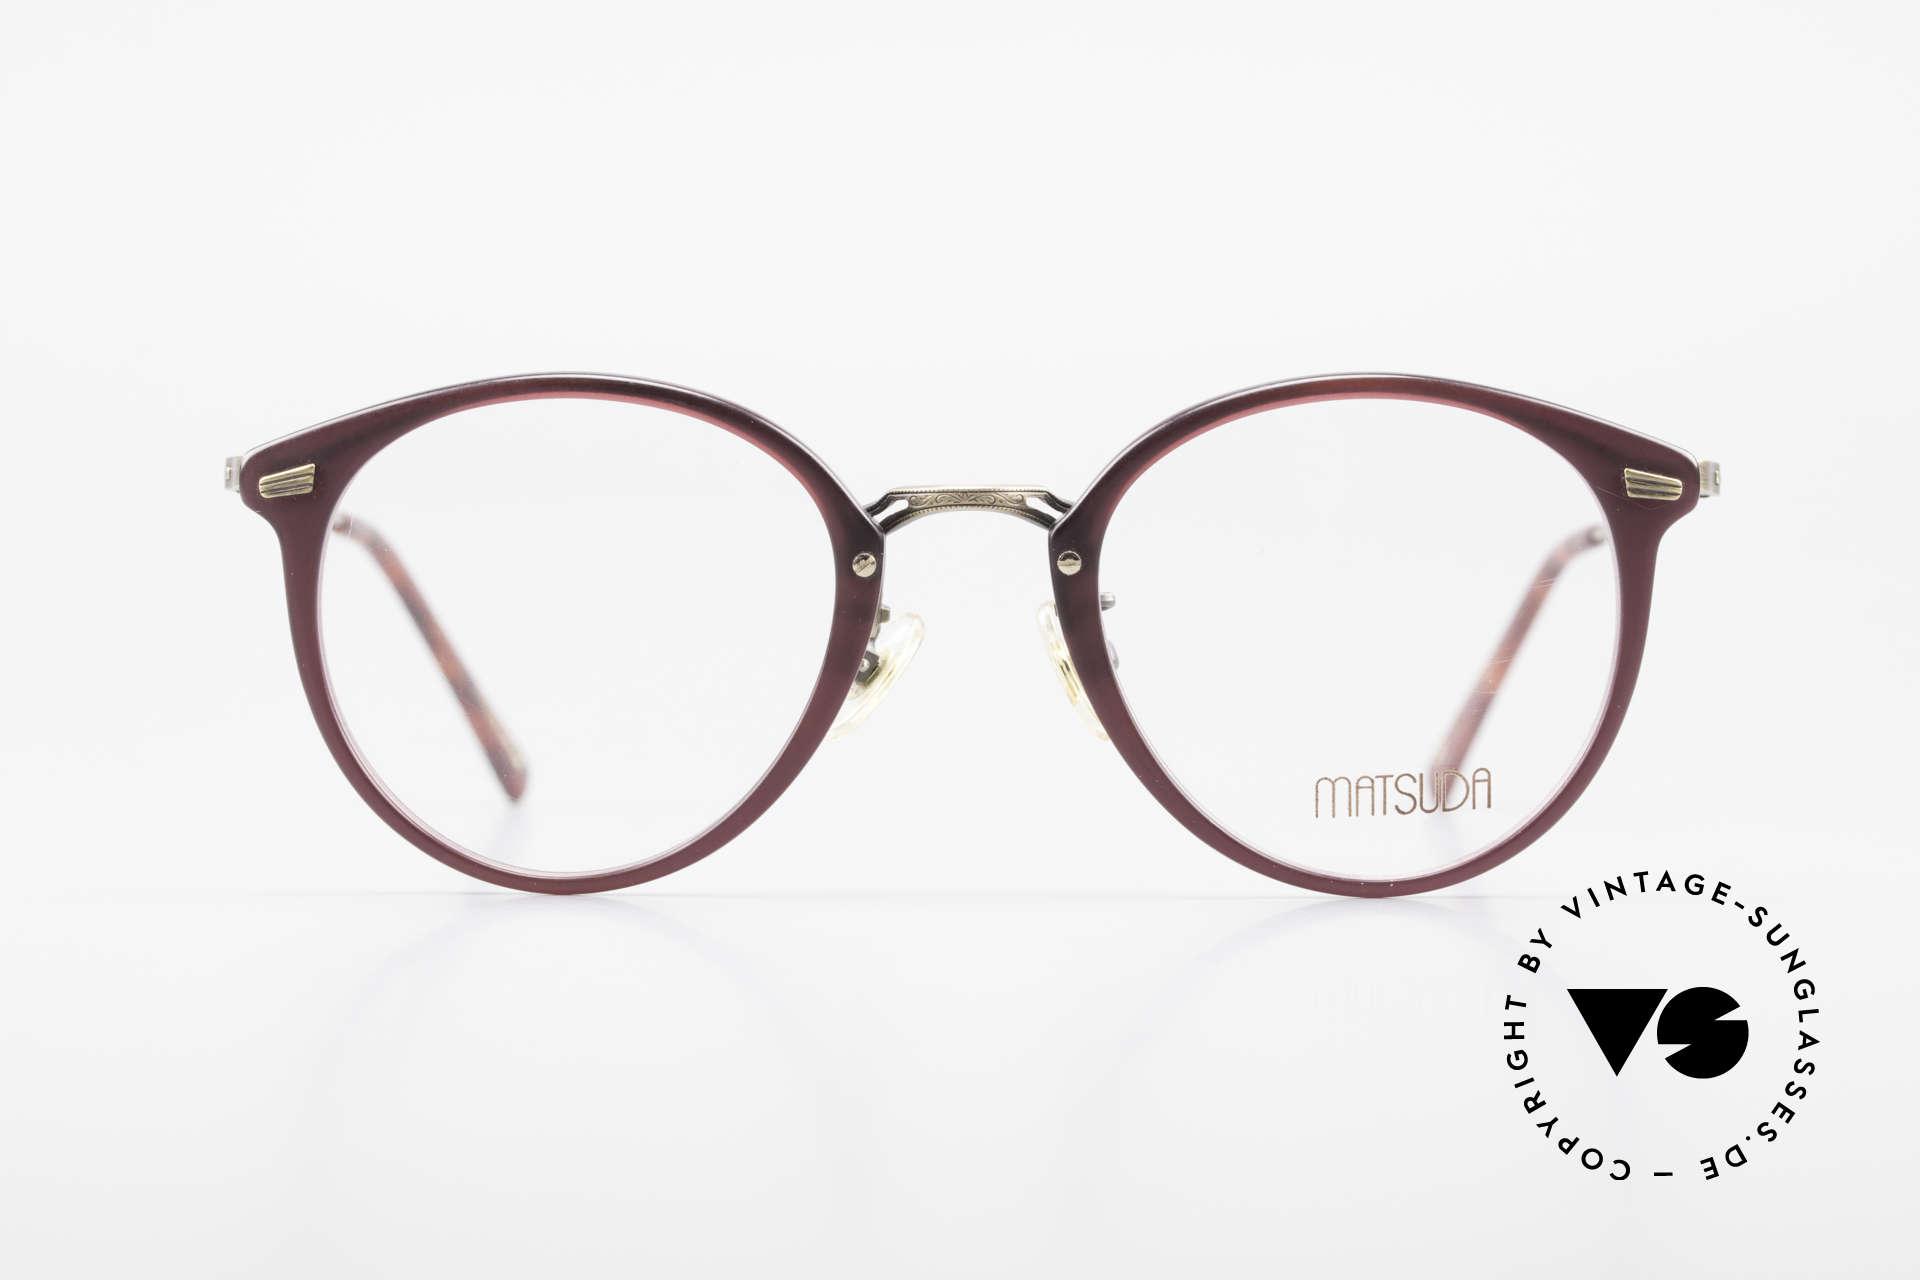 Matsuda 2836 Panto Style 90's Eyeglass-Frame, MATSUDA = a synonym for elaborate craftsmanship, Made for Men and Women